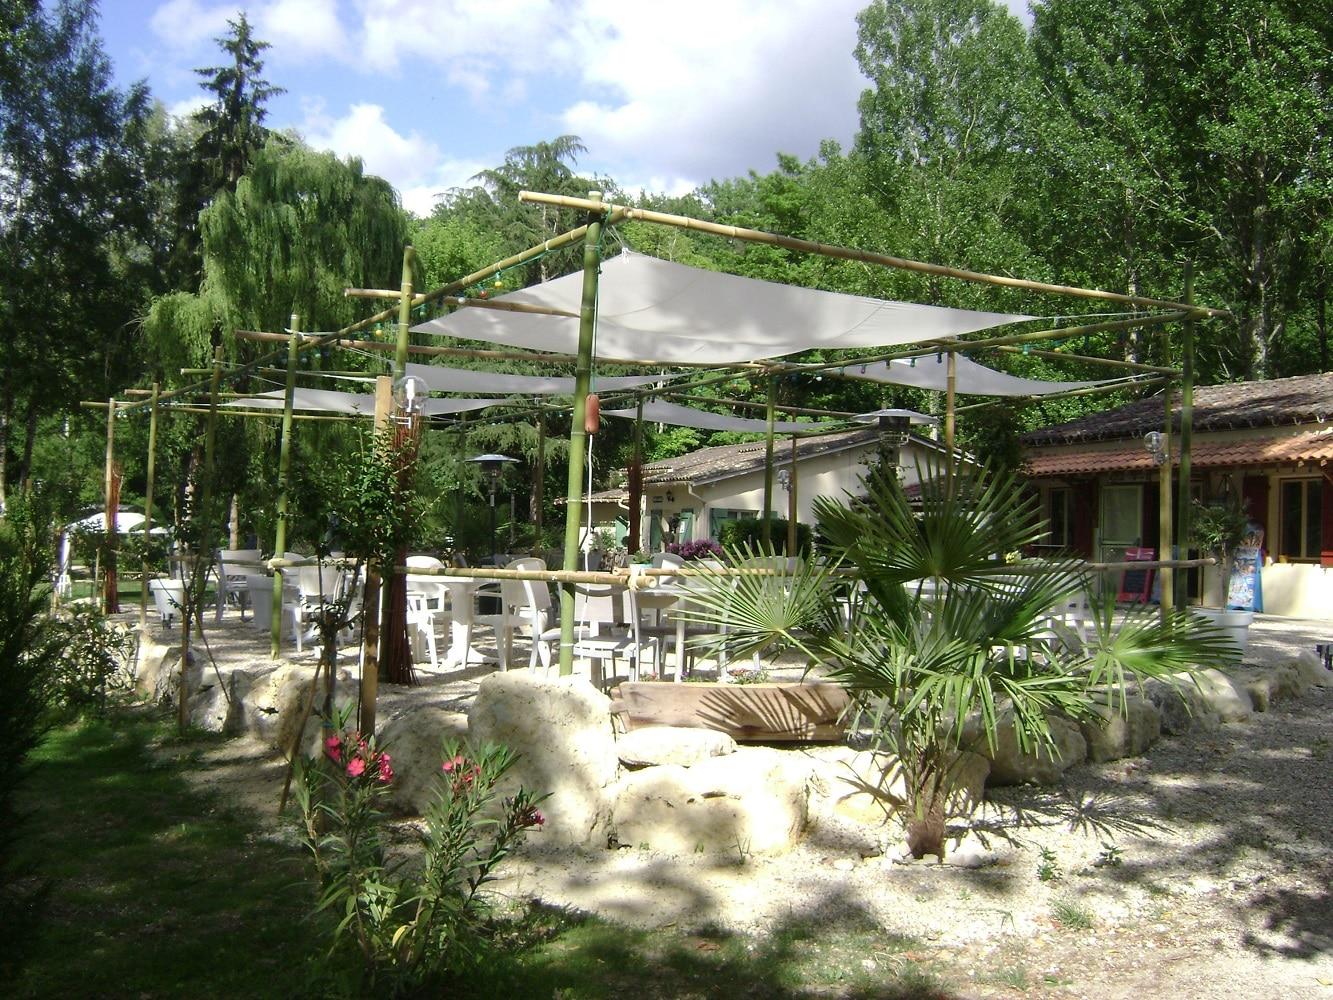 Camping de Rauzan (Gironde) - Terrasse snack